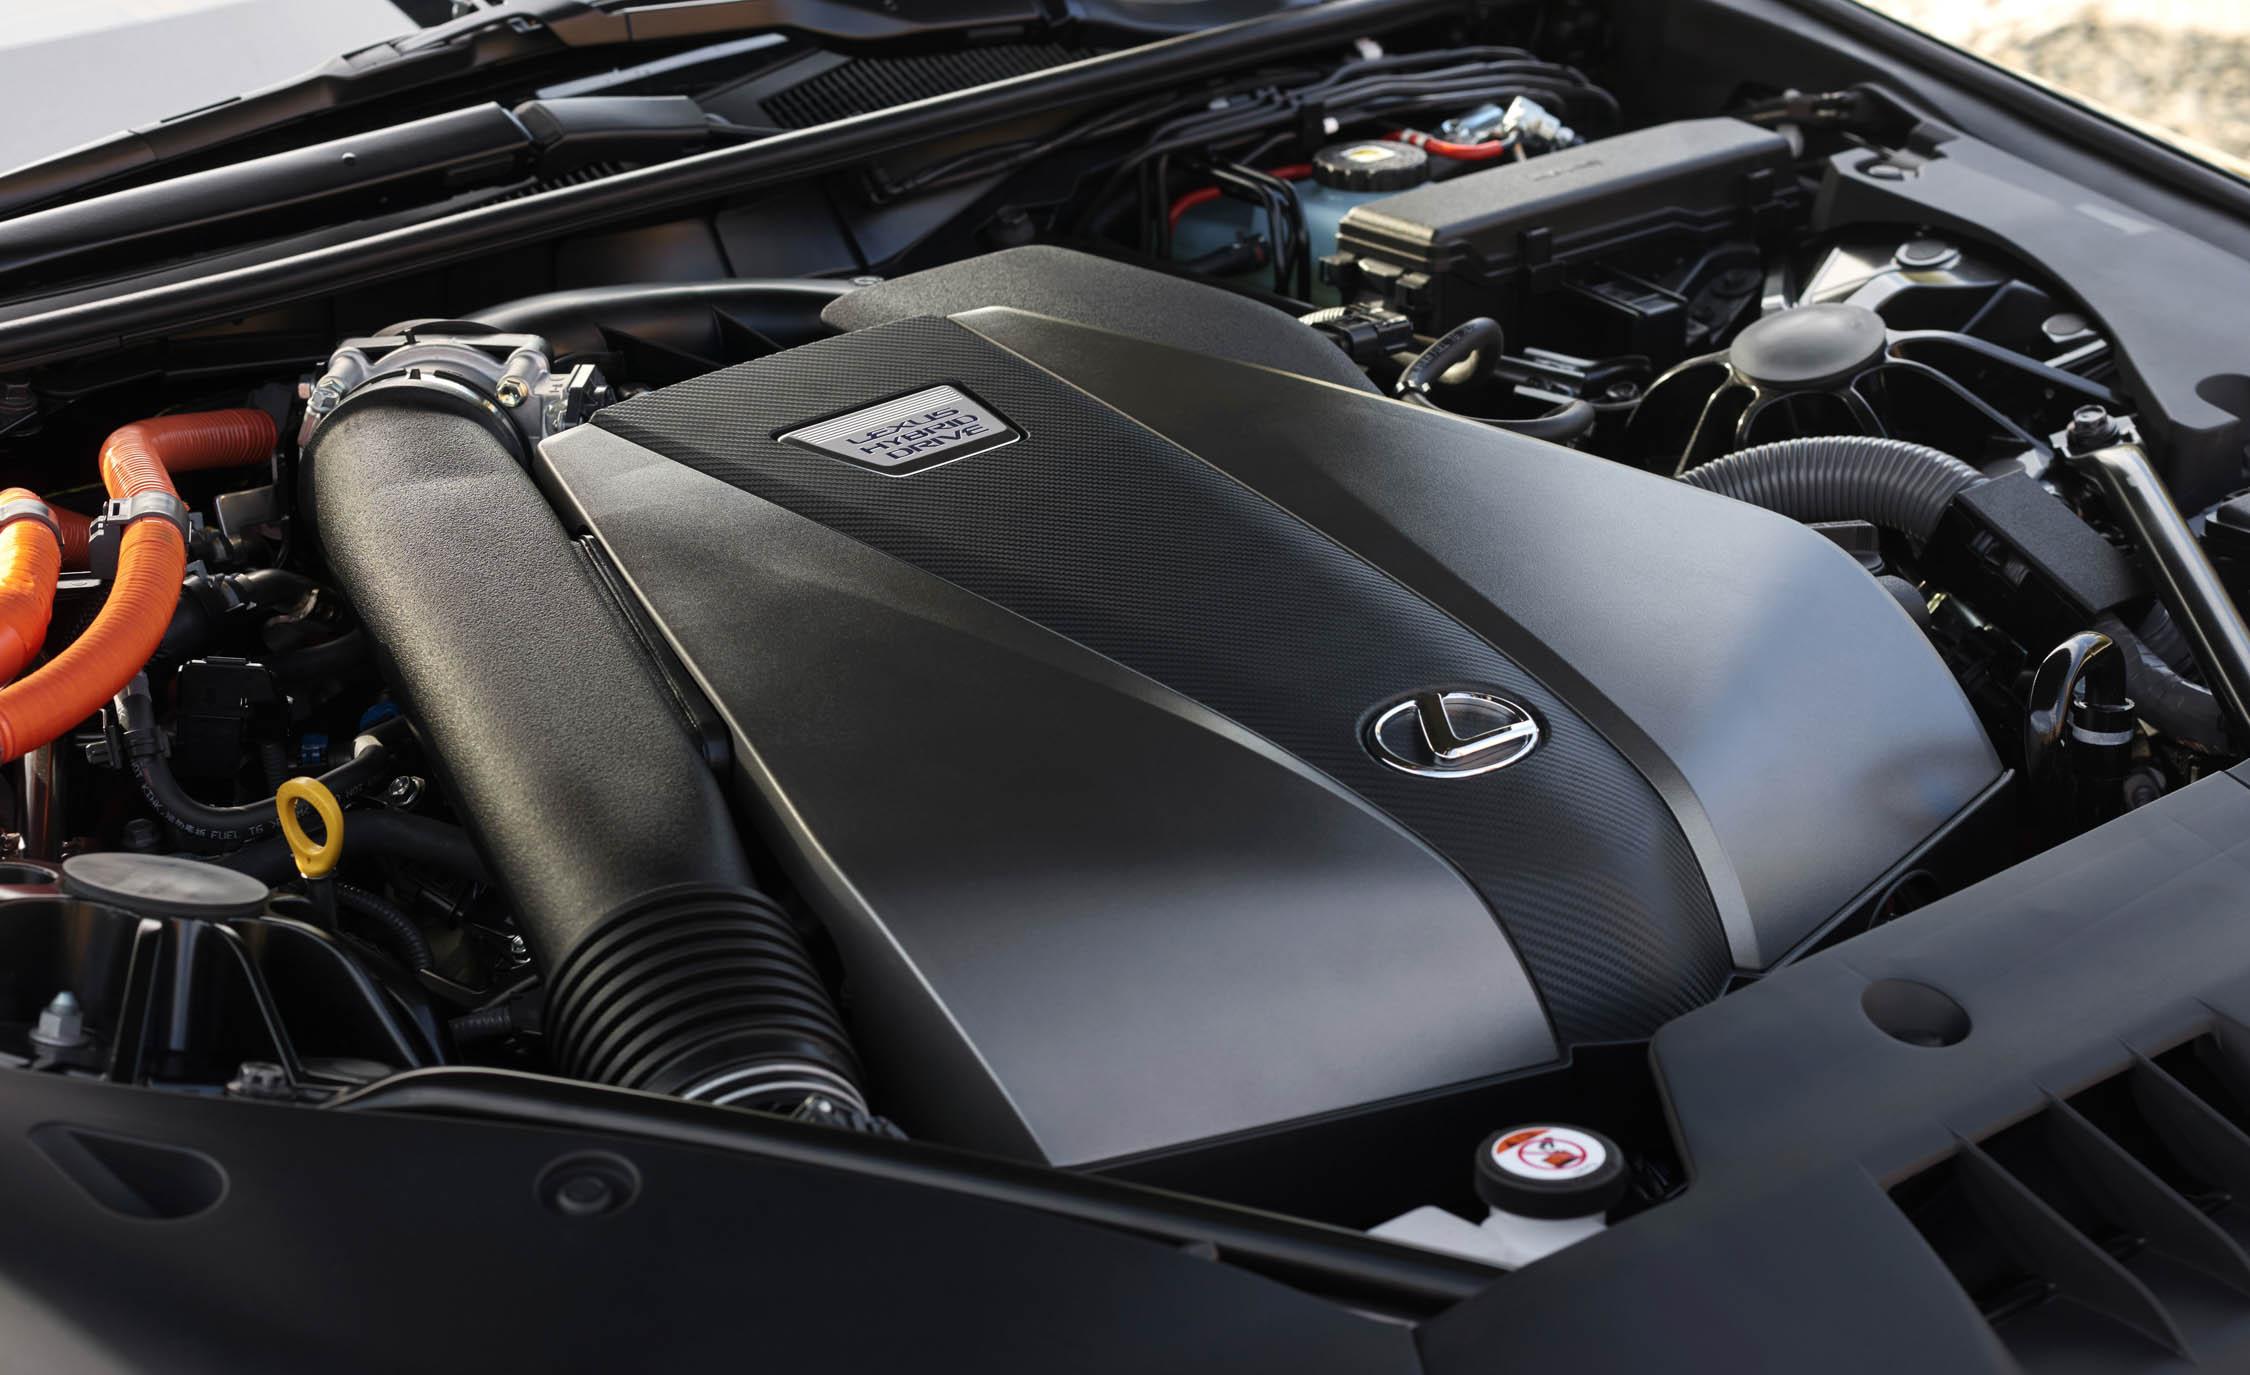 2018 Lexus Lc 500h View Engine (Photo 63 of 84)